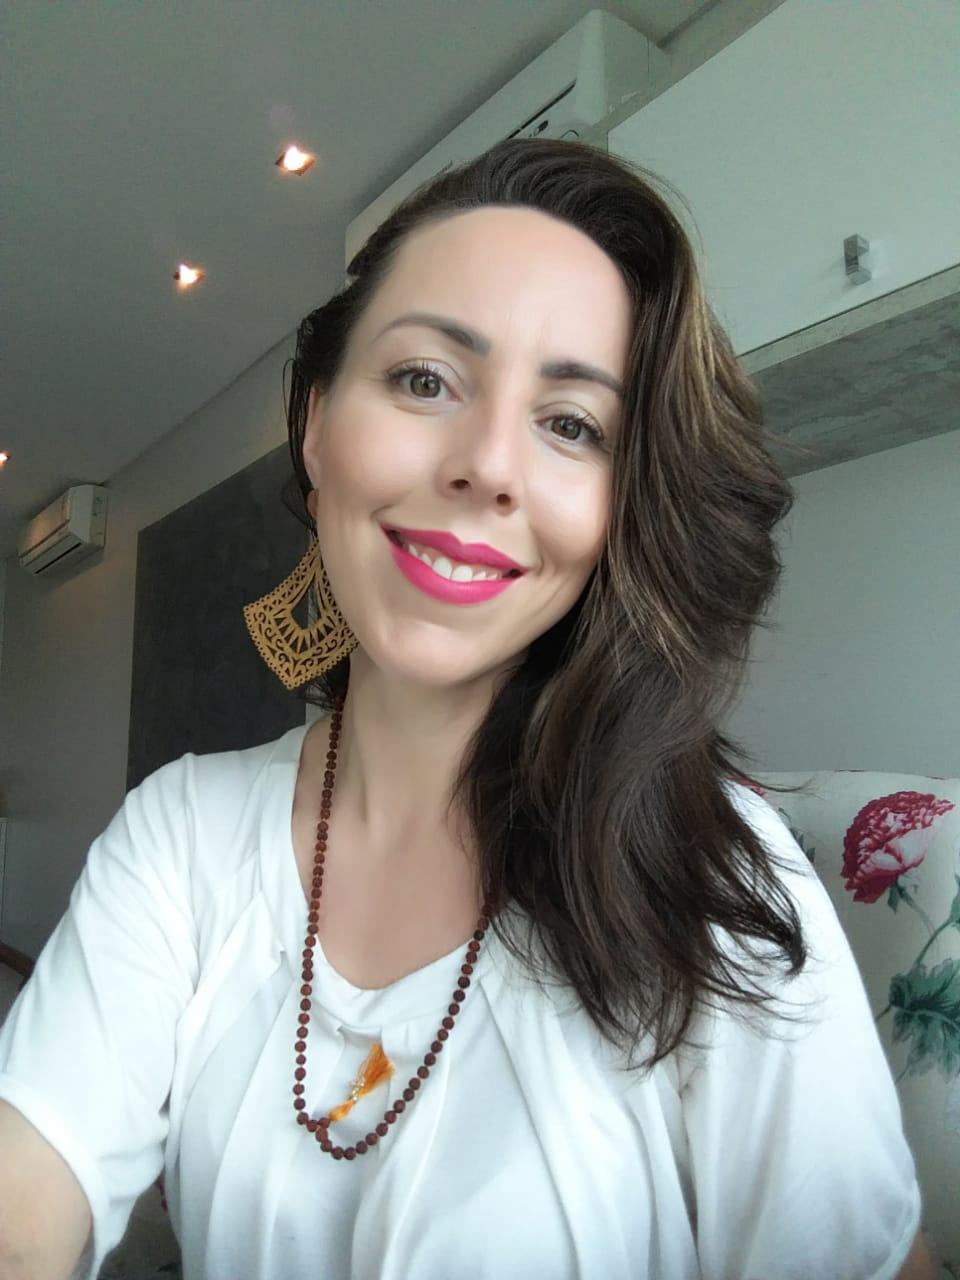 Letícia Da Silva Christianetti